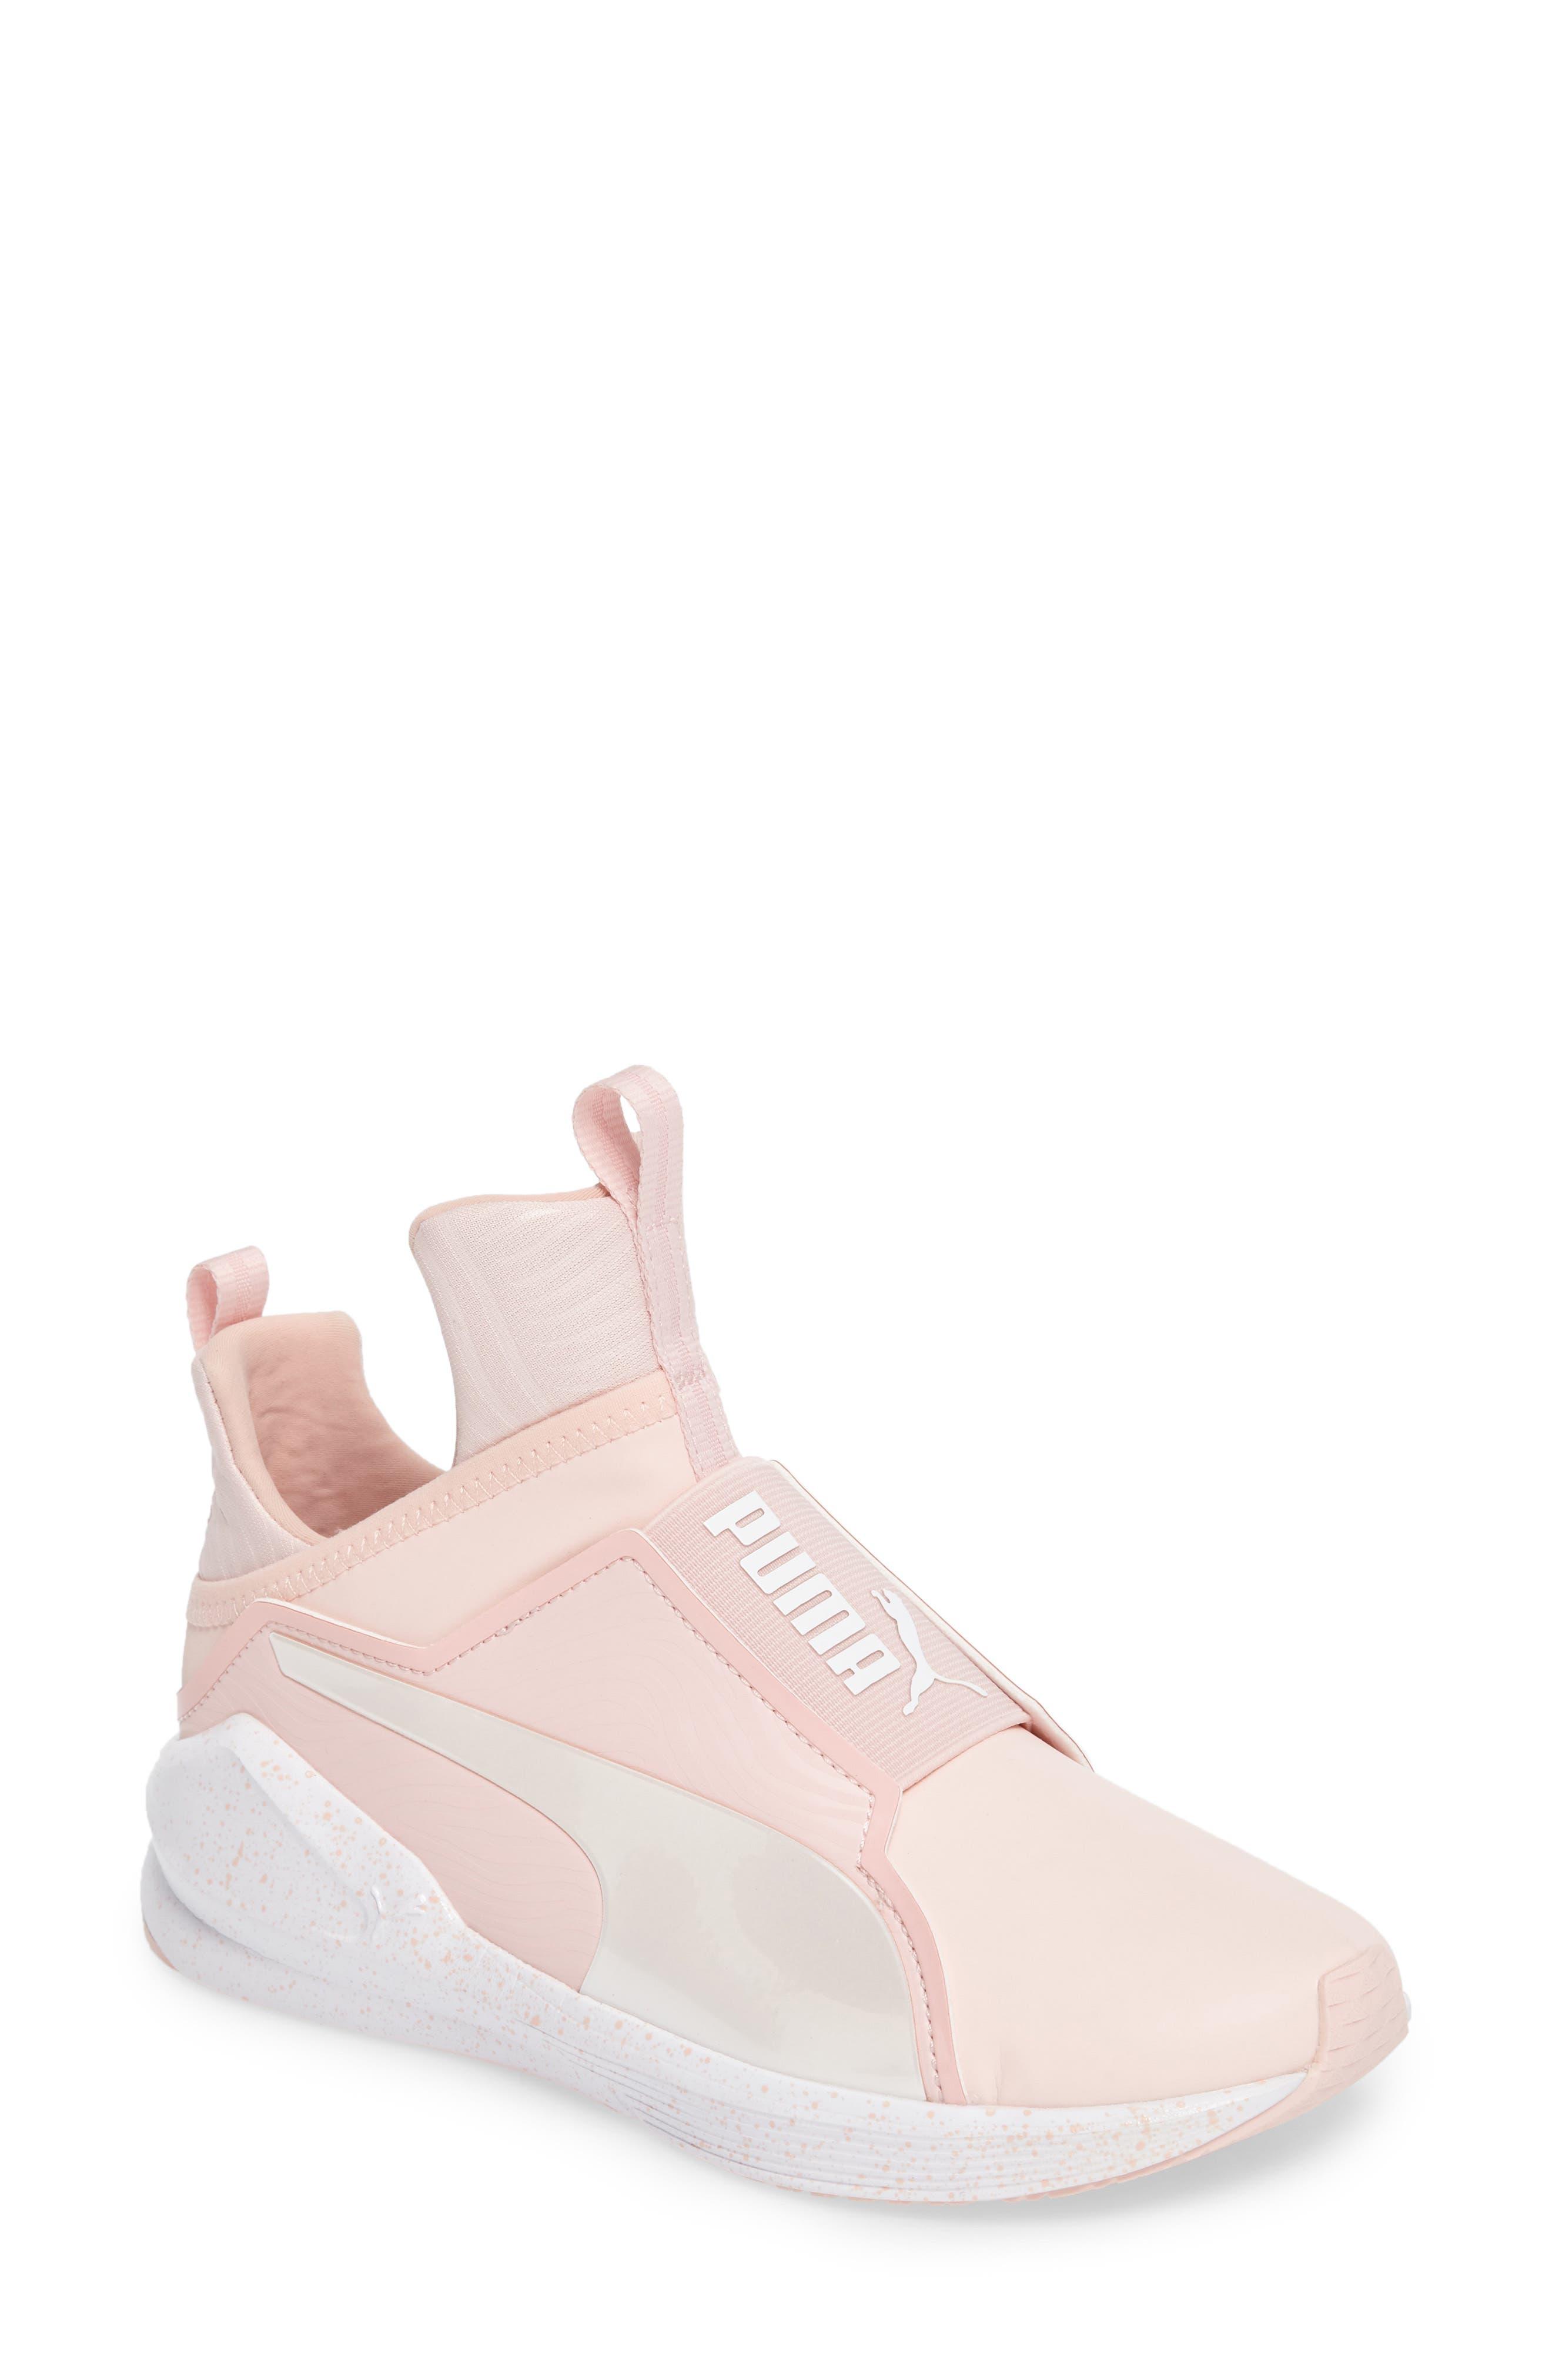 Fierce Bleached High Top Sneaker,                         Main,                         color, Veiled Rose/ Whisper White